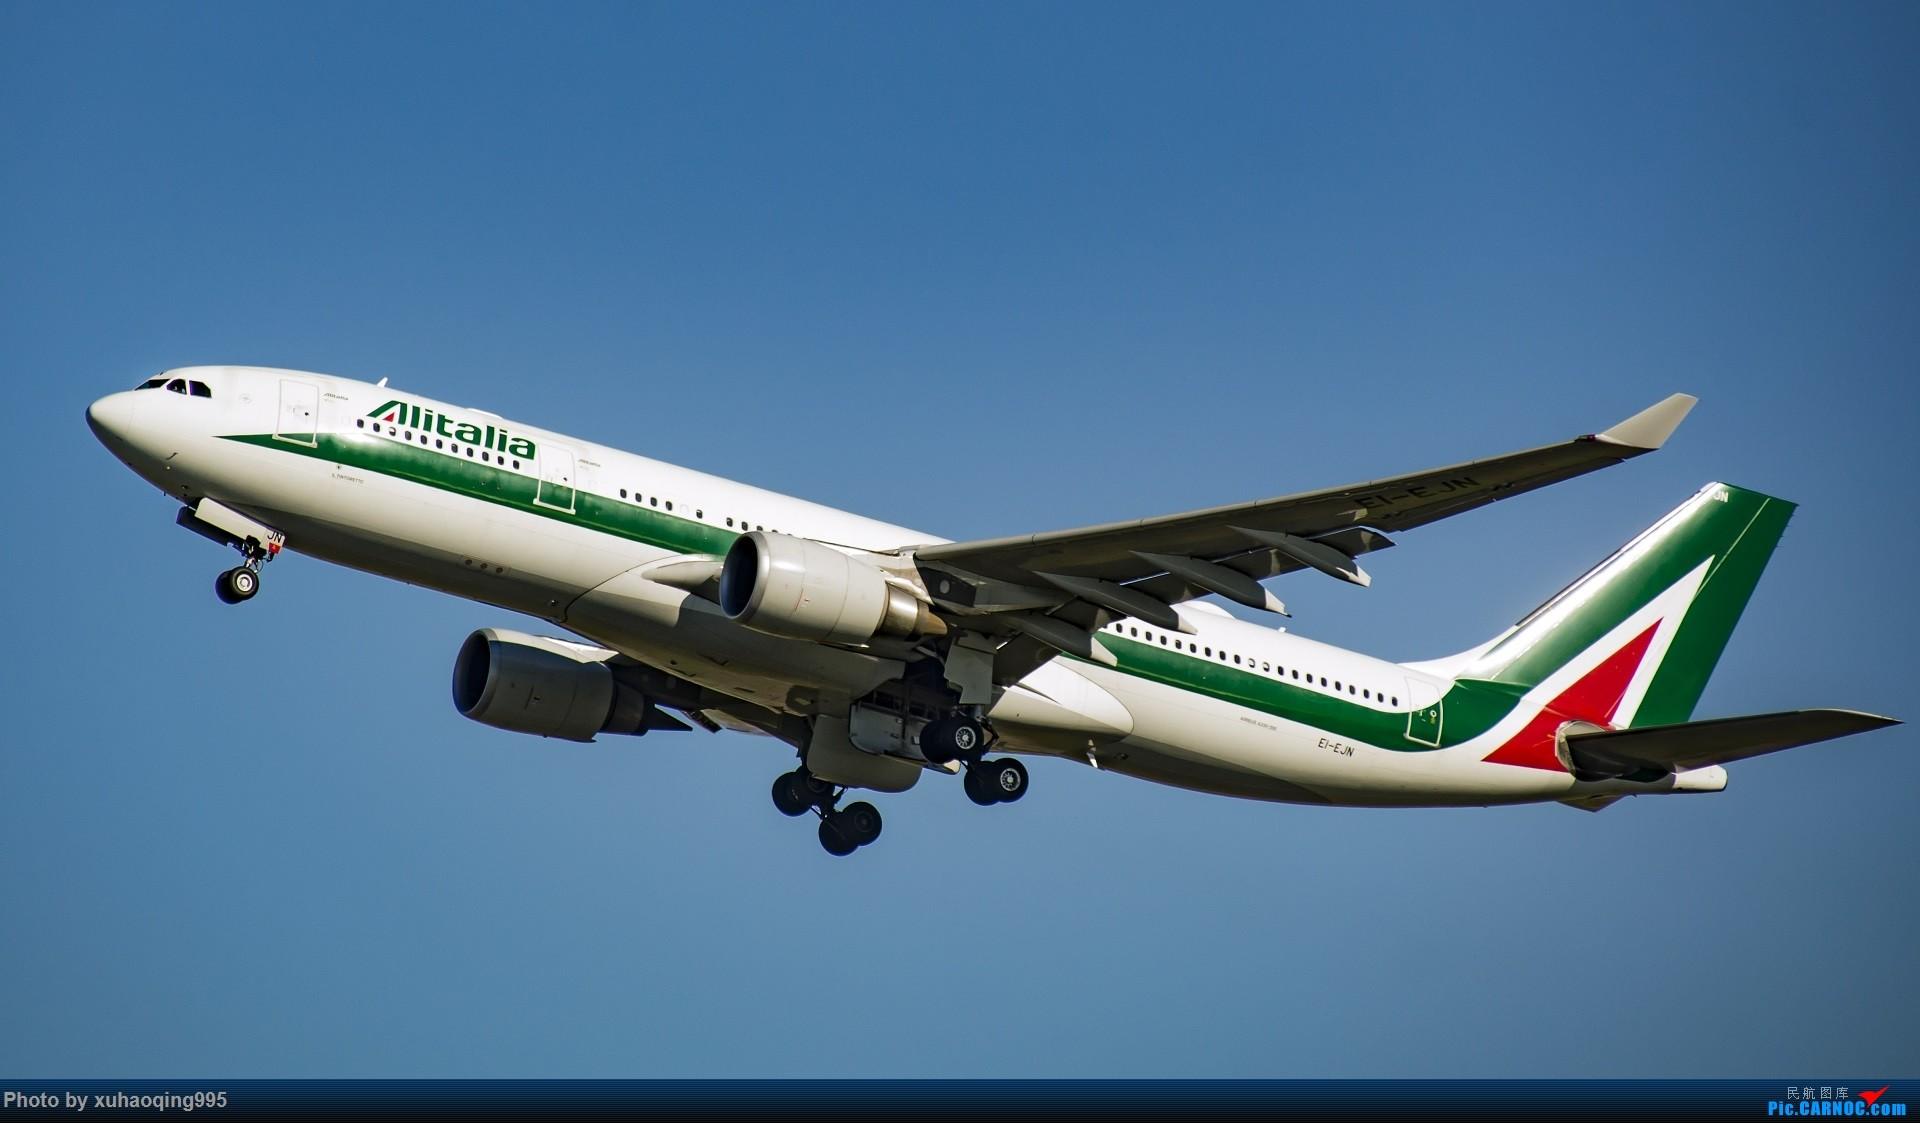 Re:[原创]罗马机场(FCO)拍机 AIRBUS A330-200 EI-EJN 意大利菲乌米奇诺机场